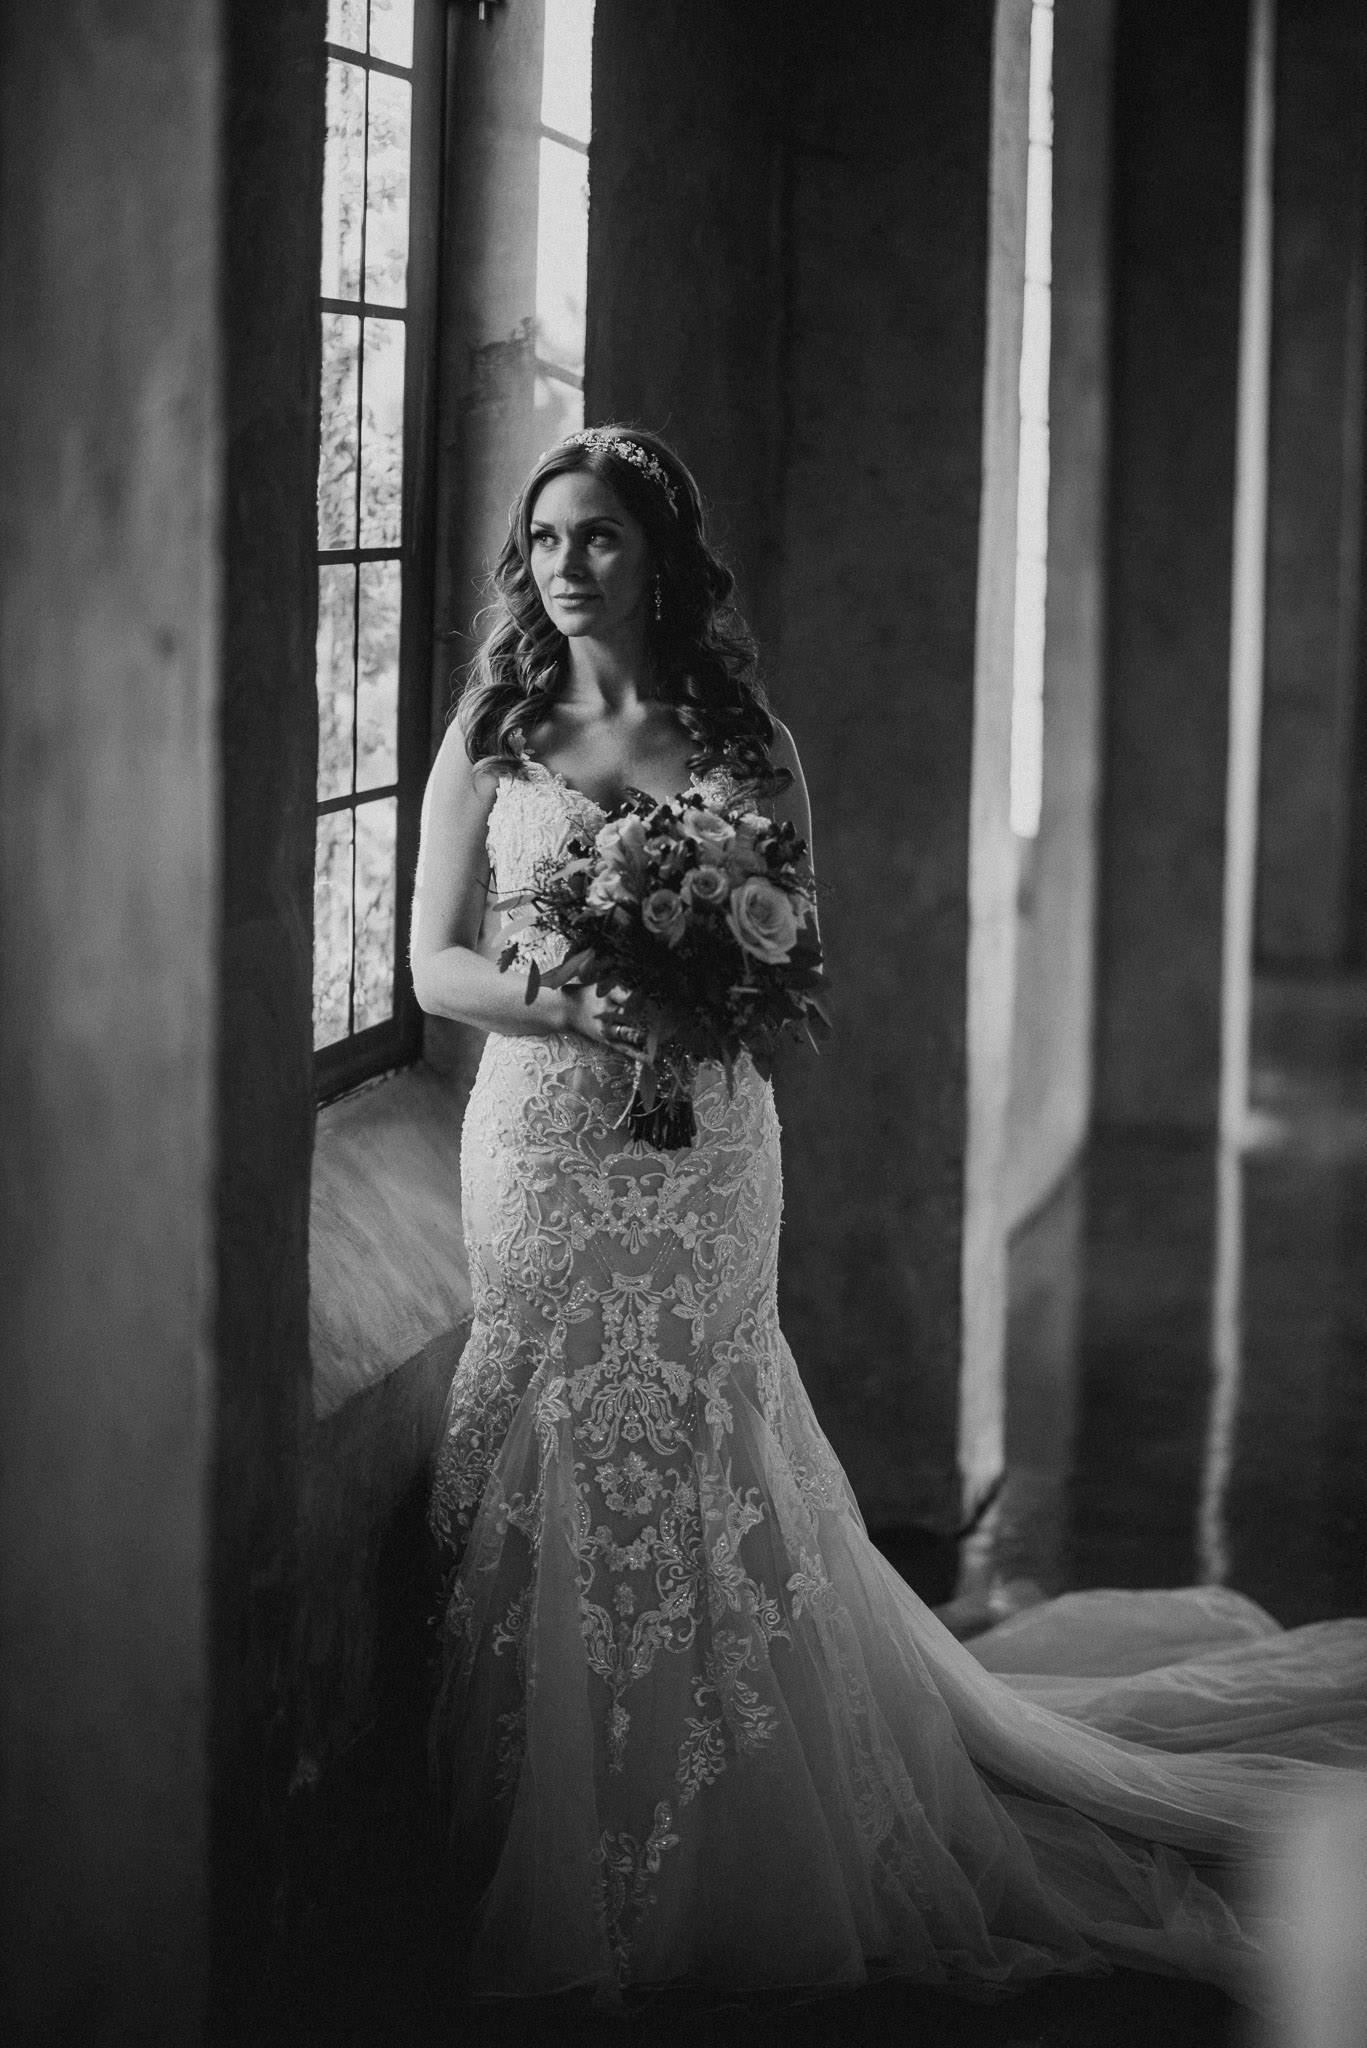 Cynthia-Curtis-Olde-Dobbine-Station-Houston-Wedding-Photographer-sm-55.jpg